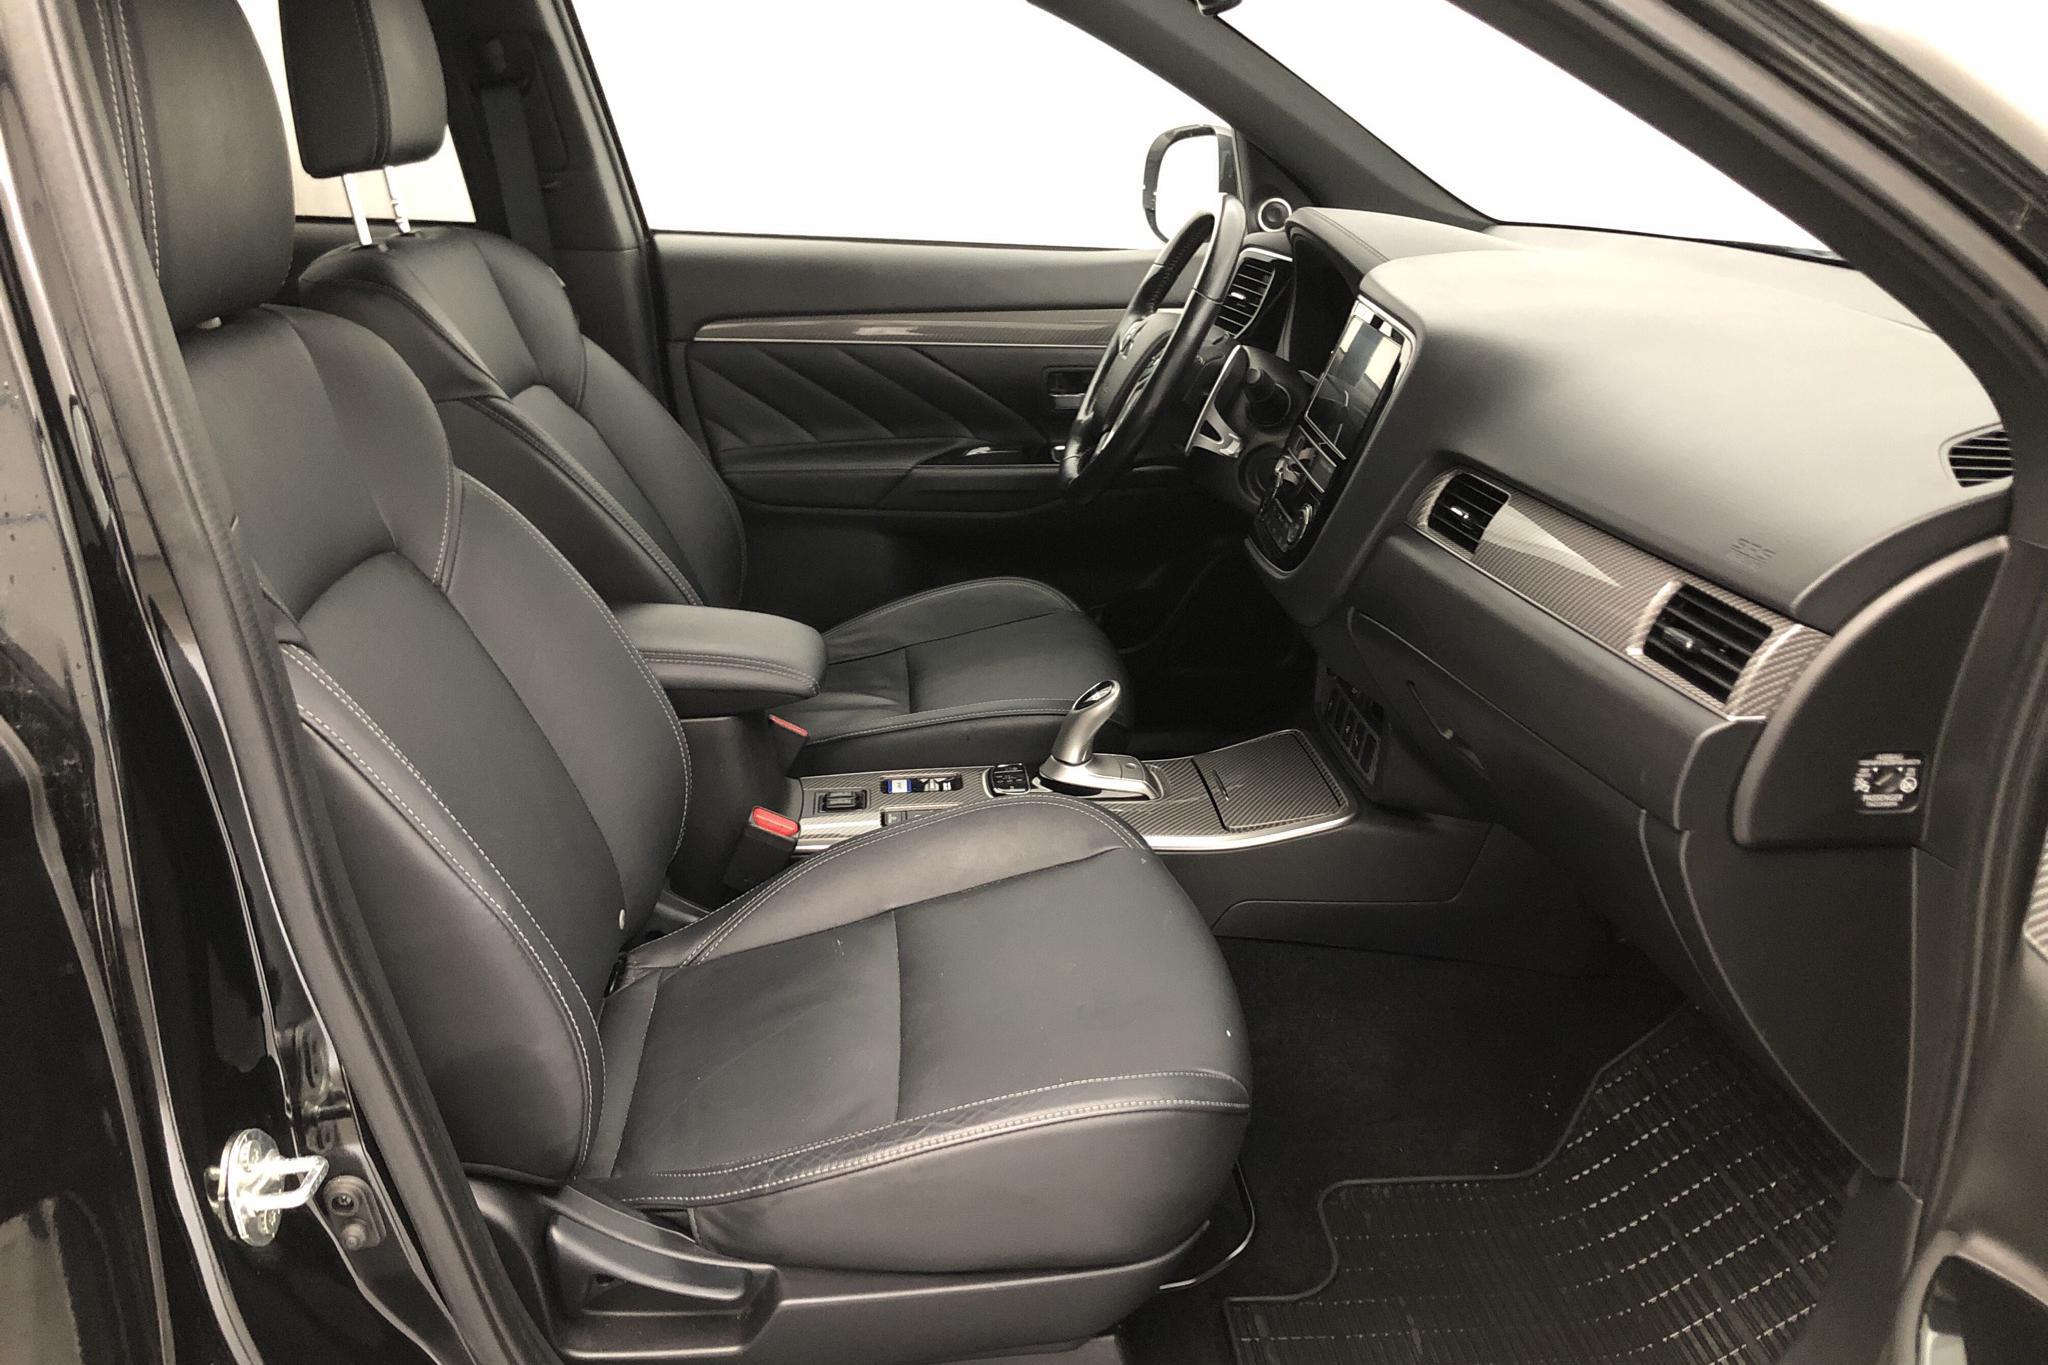 Mitsubishi Outlander 2.4 Plug-in Hybrid 4WD (136hk) - 6 287 mil - Automat - svart - 2019